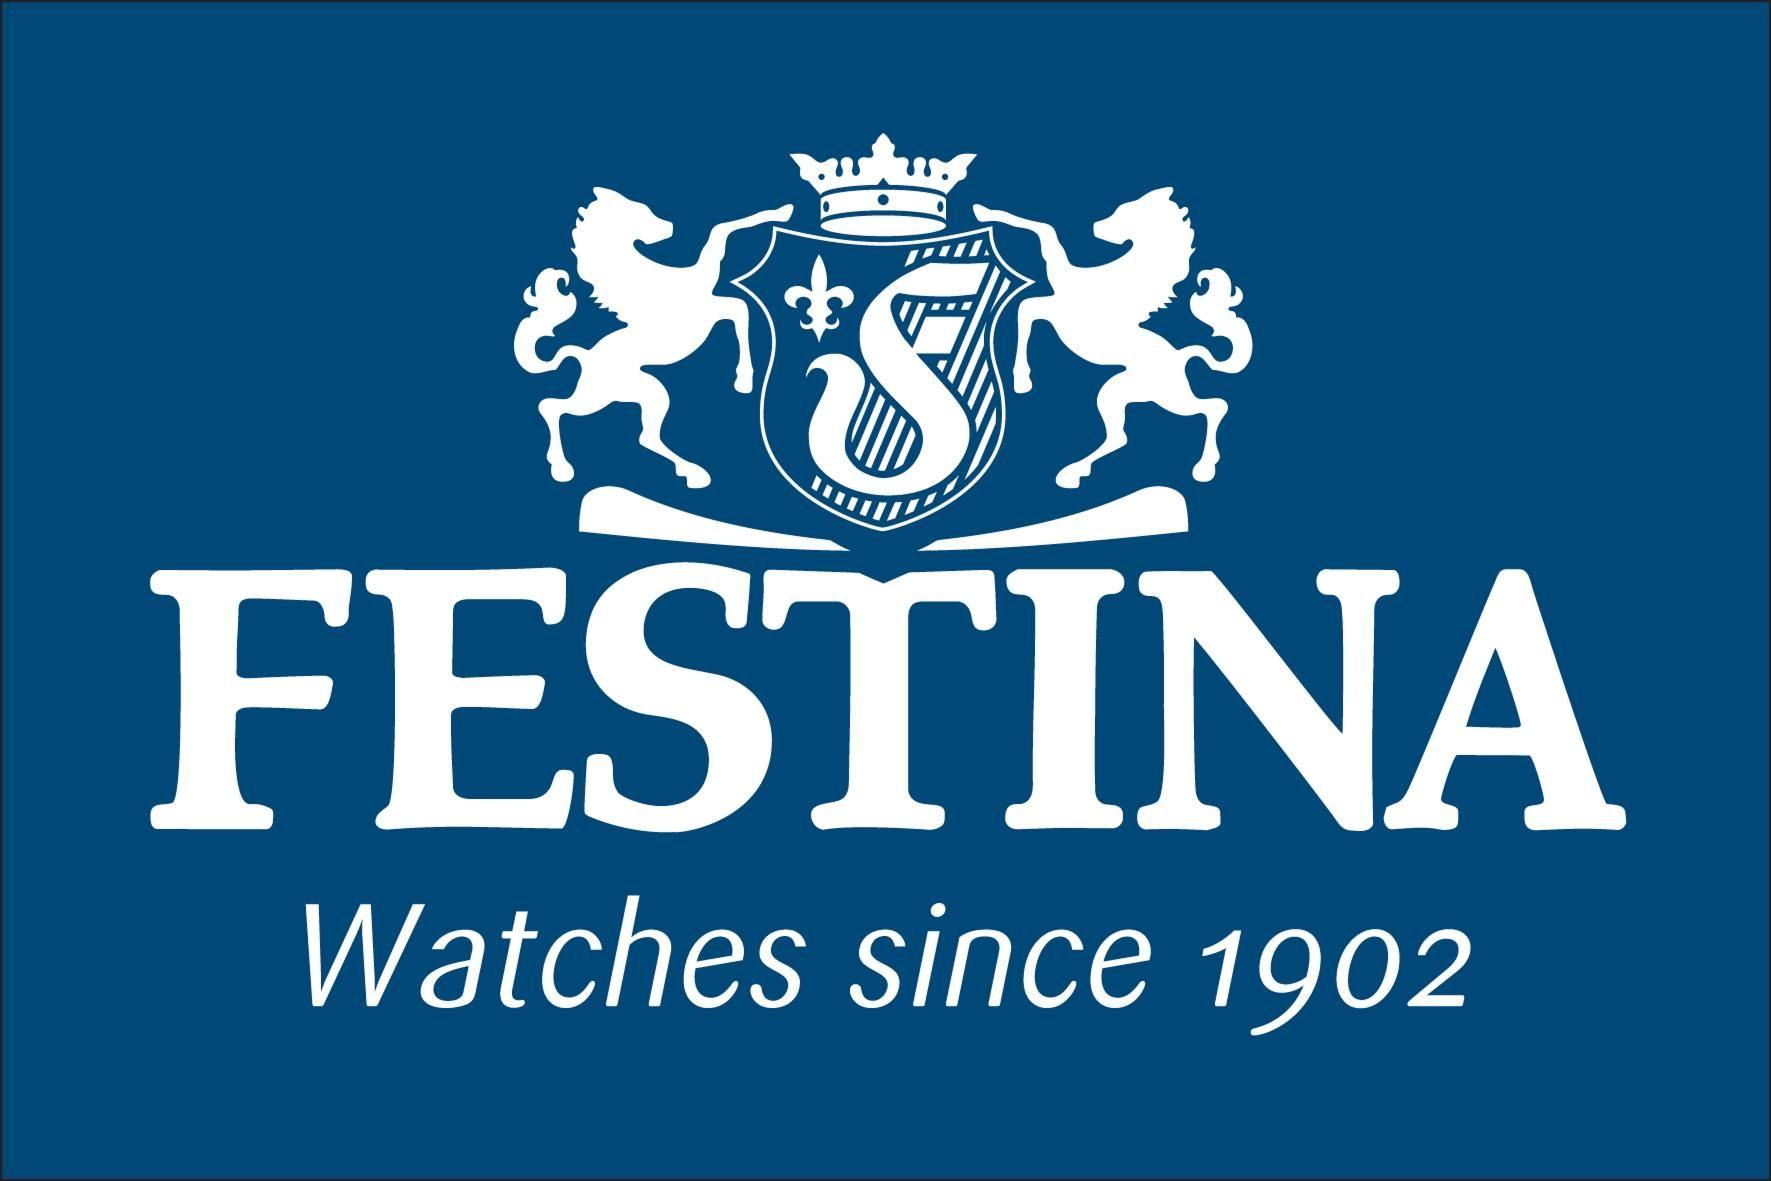 Festina Group